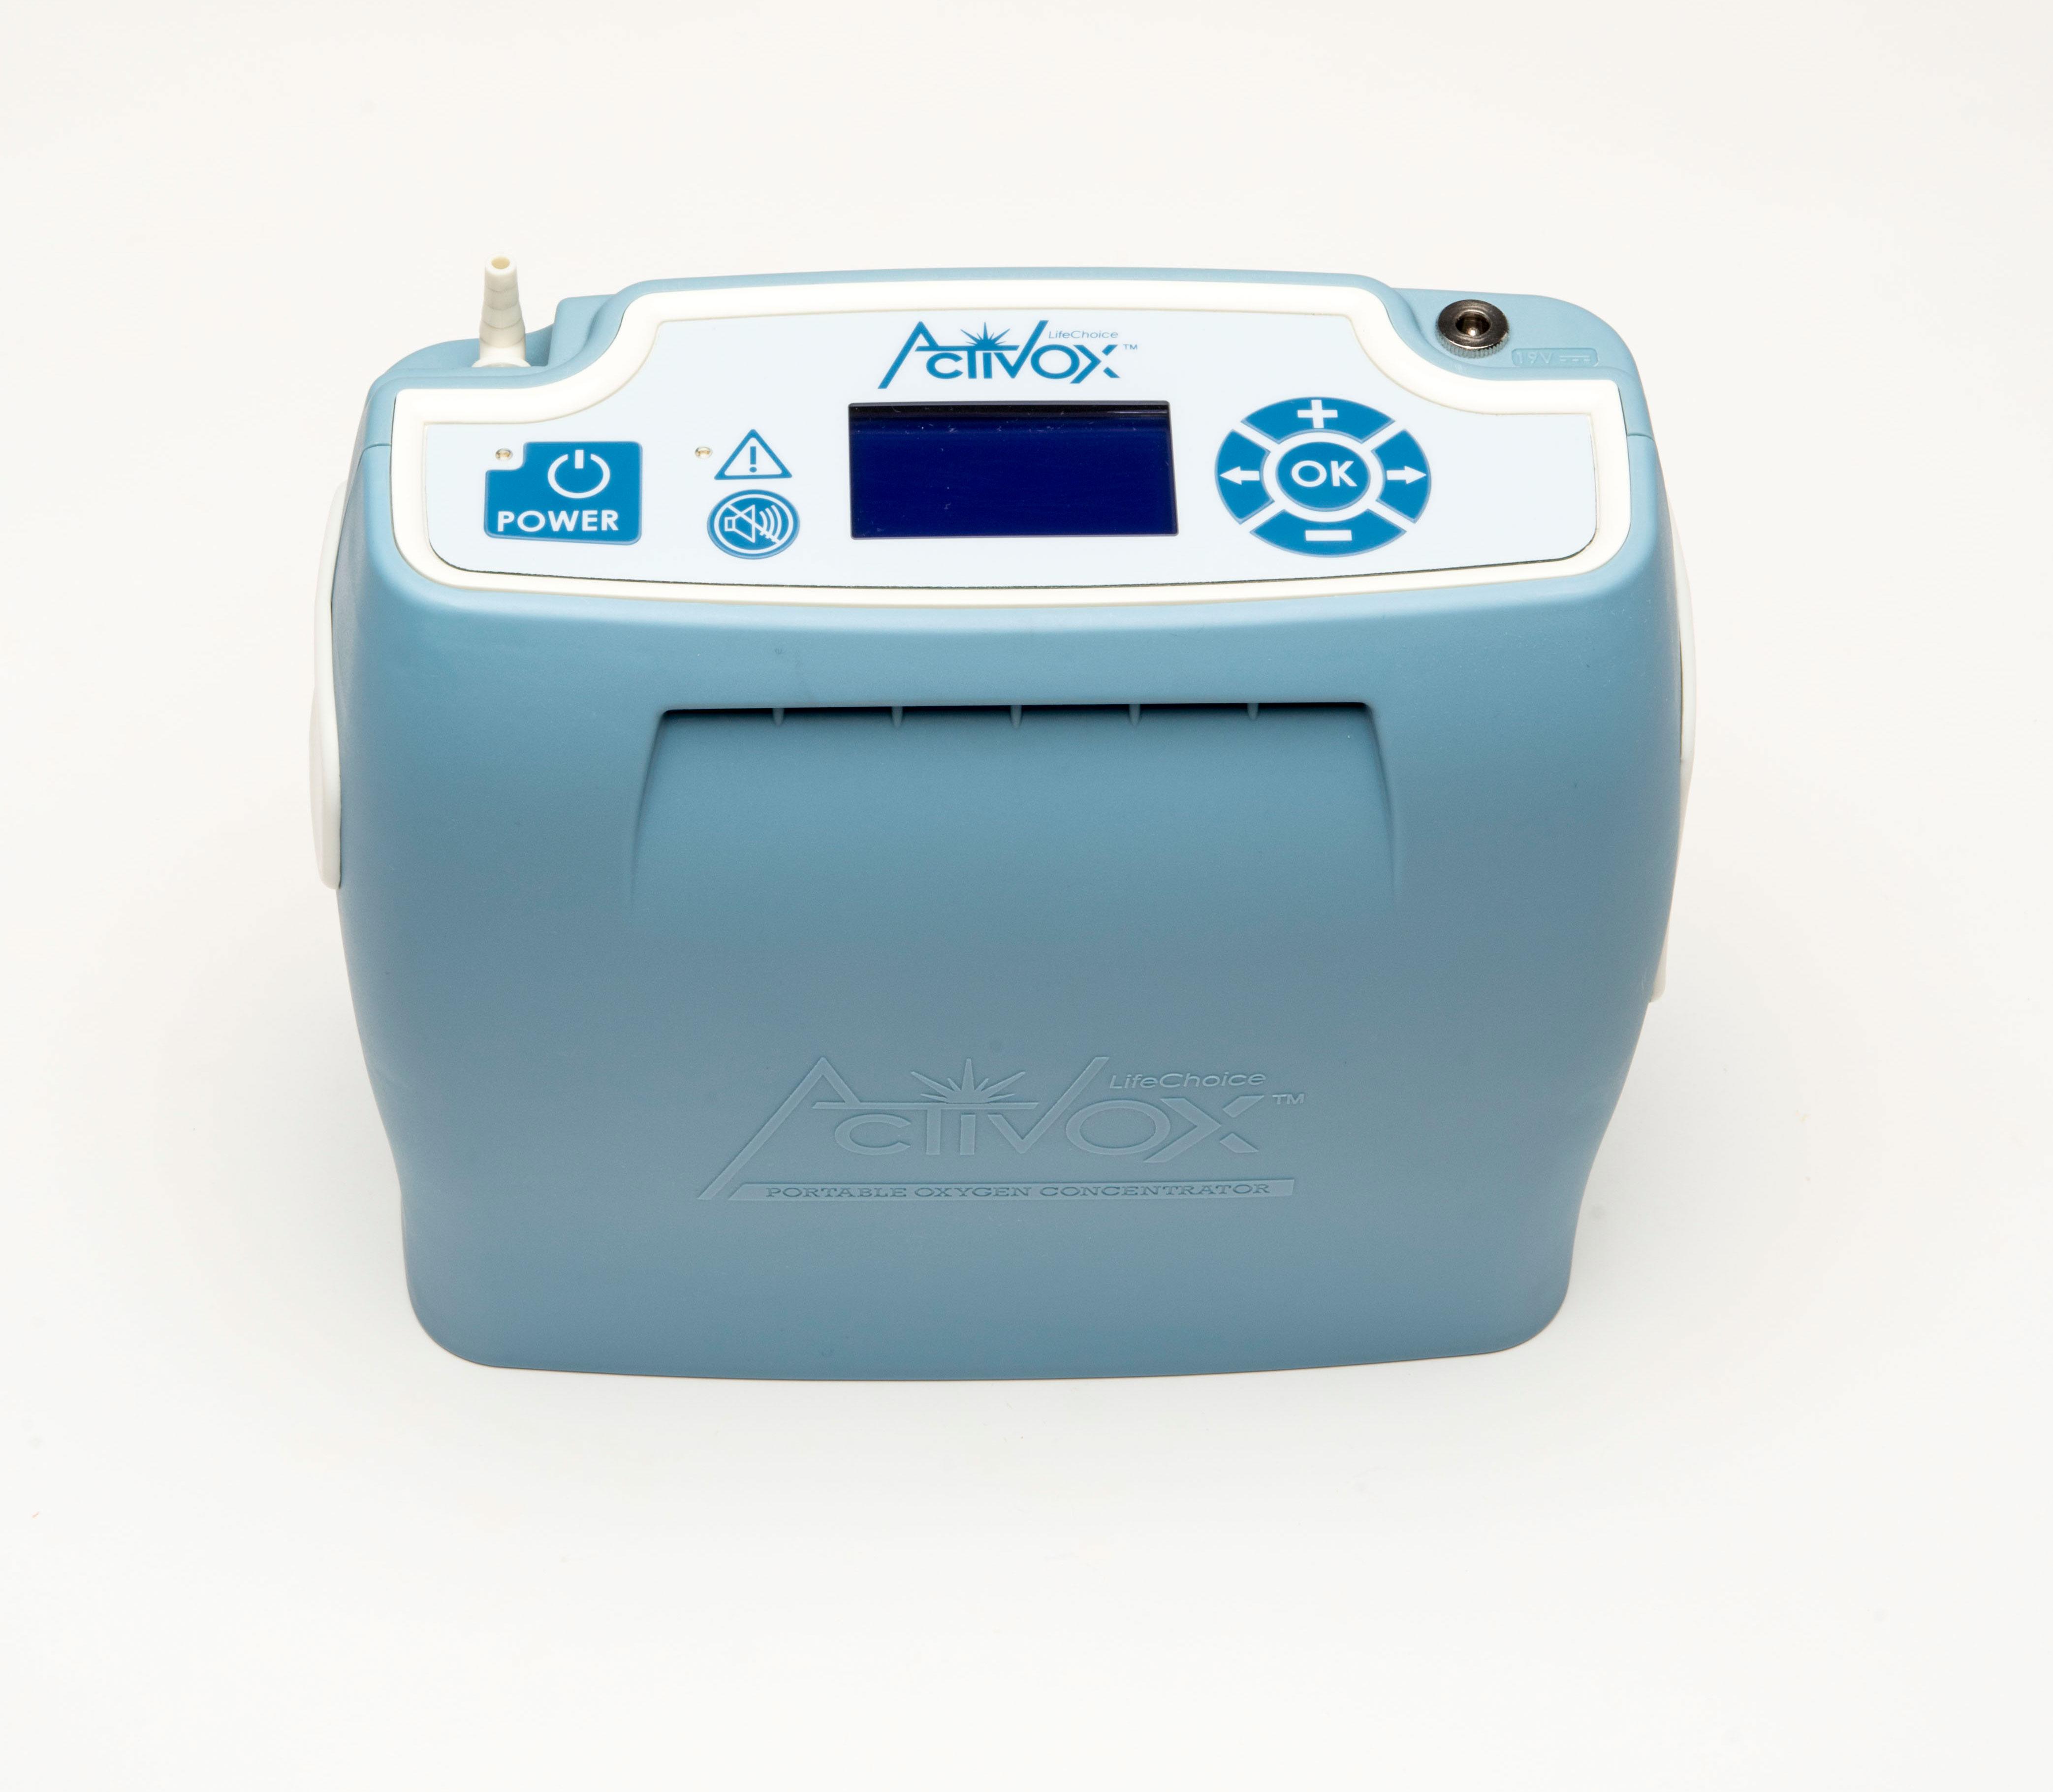 Permalink to Lifechoice Activox Portable Oxygen Concentrator